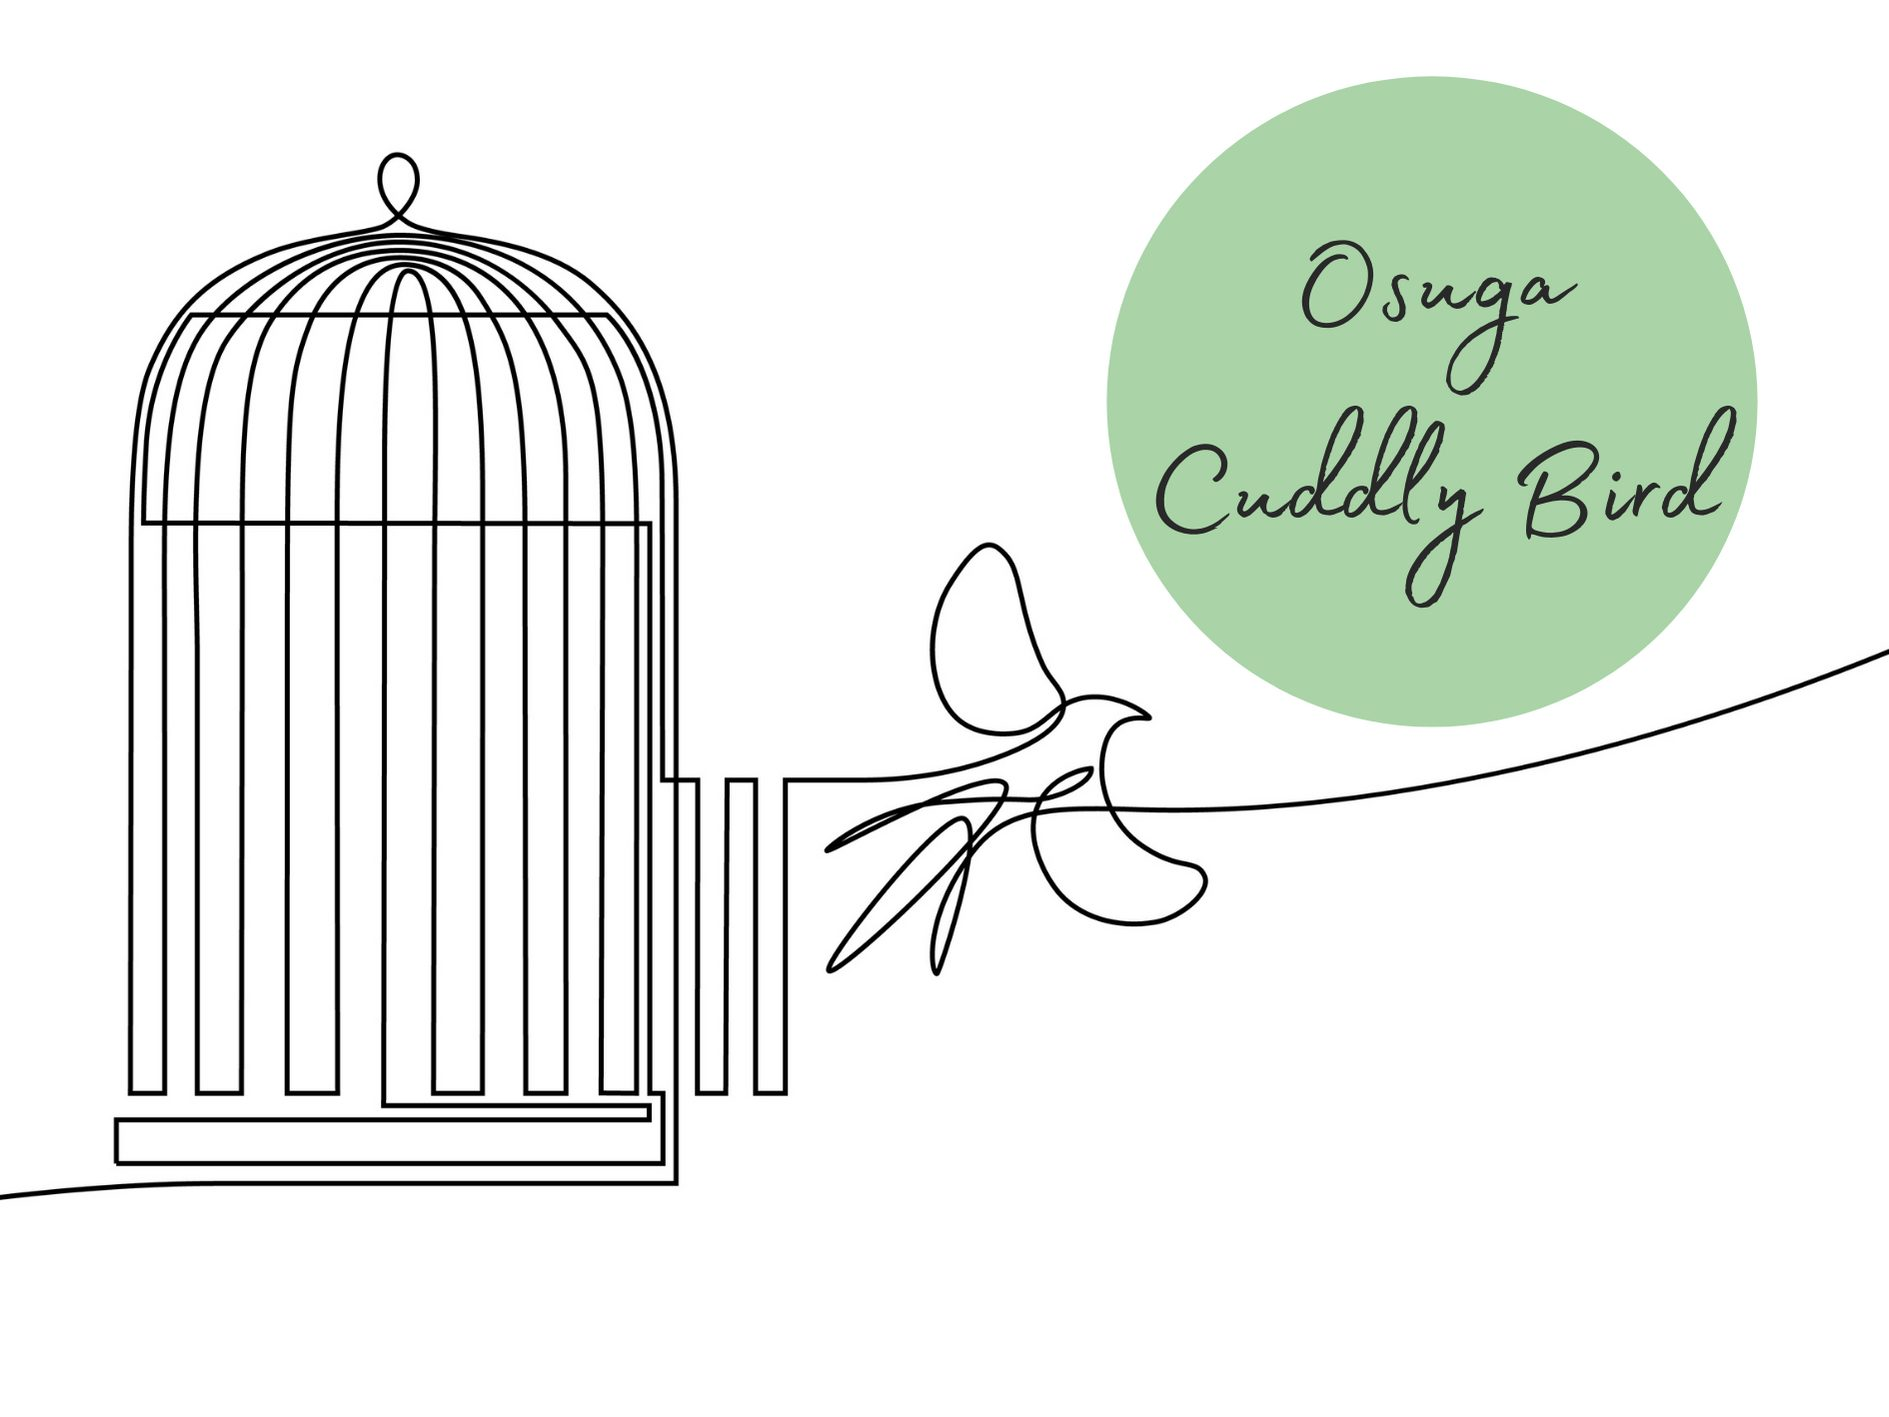 [Toy Review] Osuga Cuddly Bird